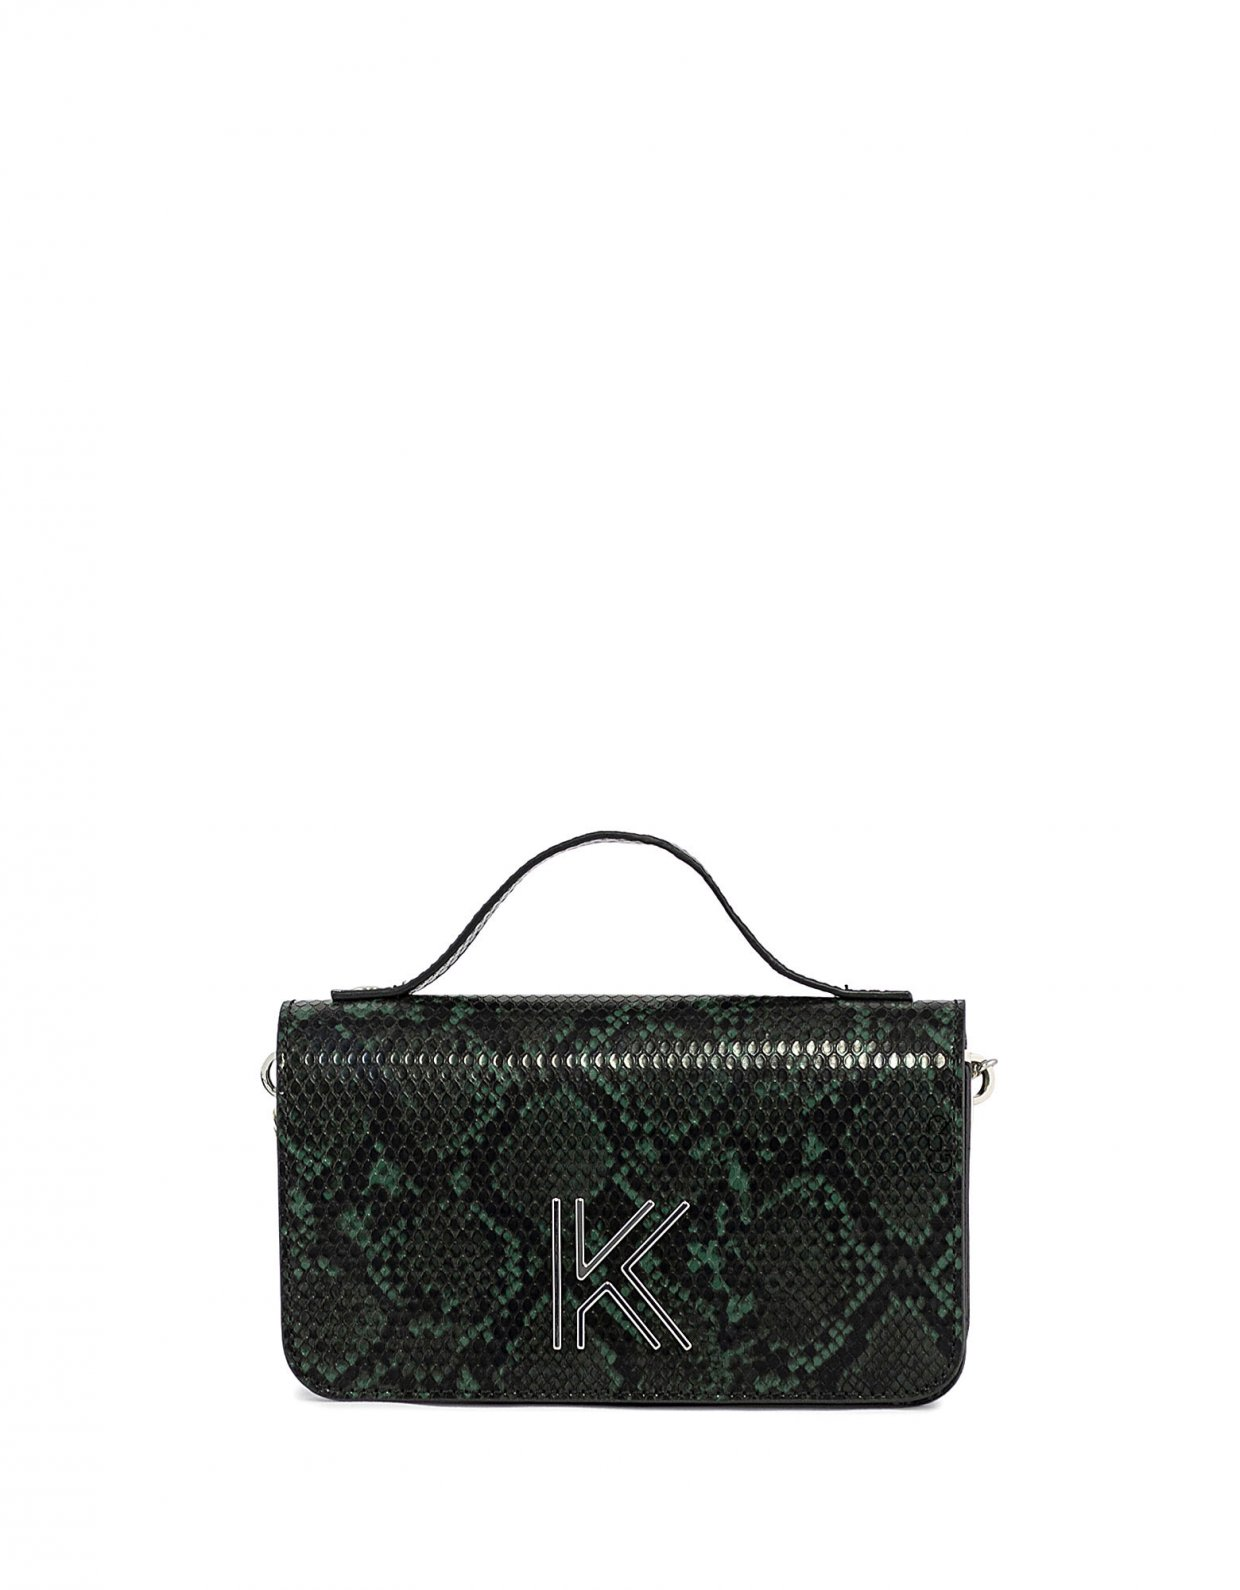 Kendall + Kylie Ida crossbody green snake